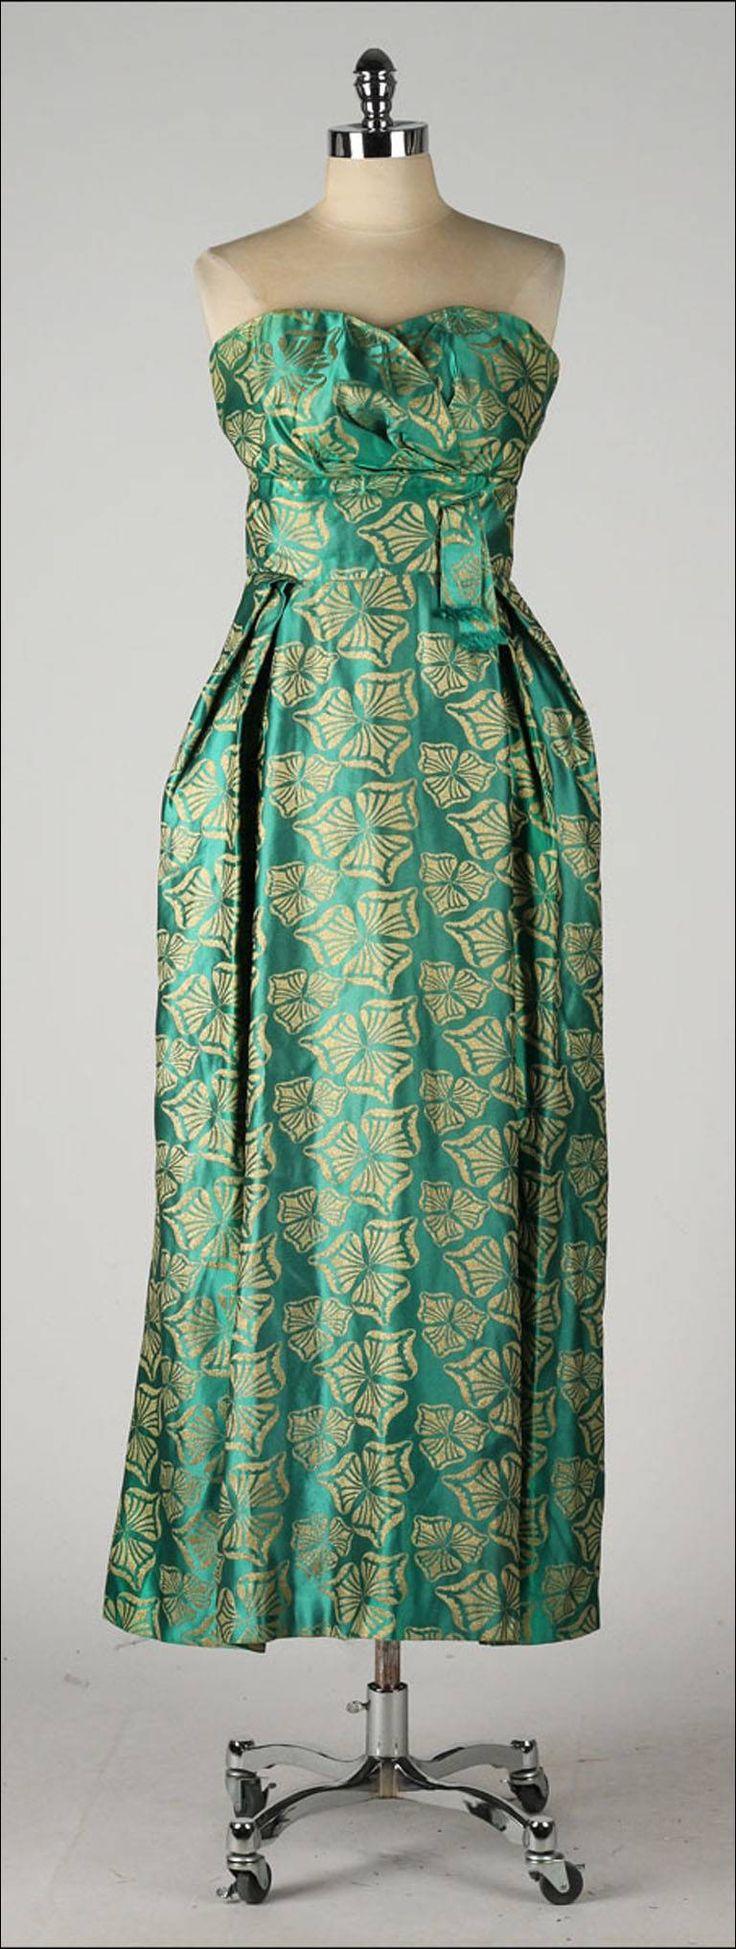 Vintage 1950's Helena Barbieri Green Silk Satin Brocade Dress